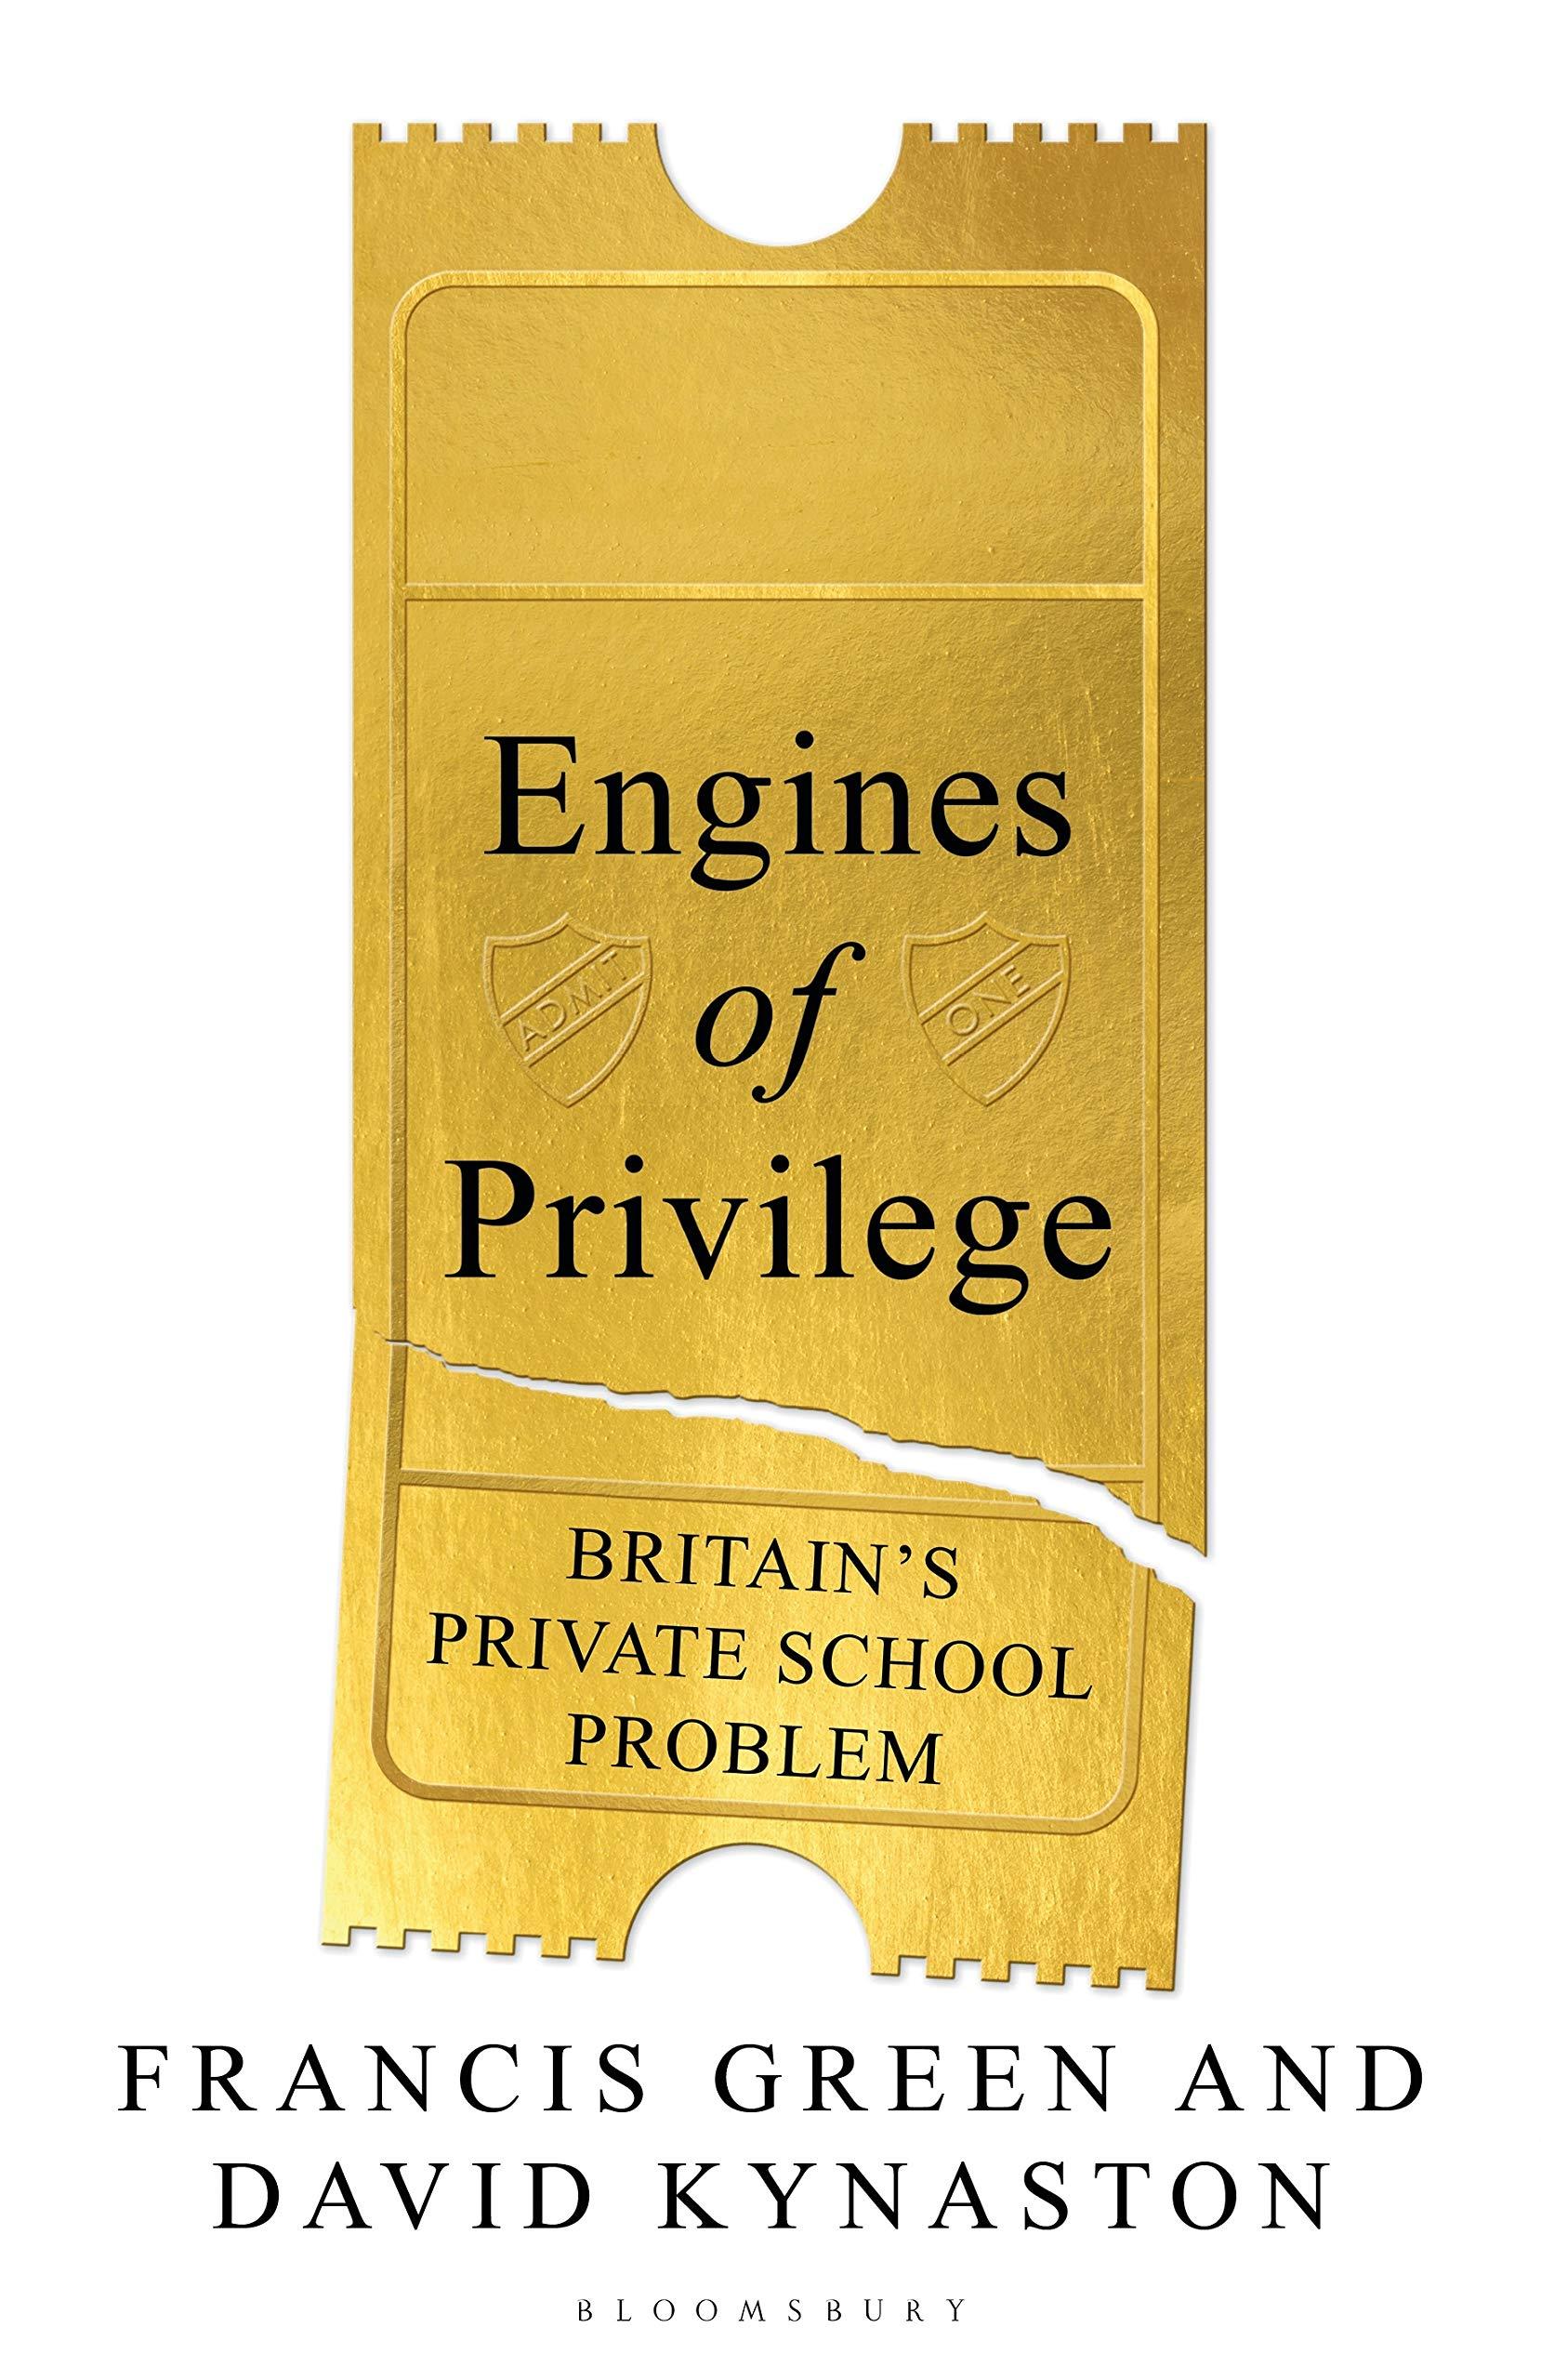 Britain's Private School Problem  - Francis Green & David Kynaston